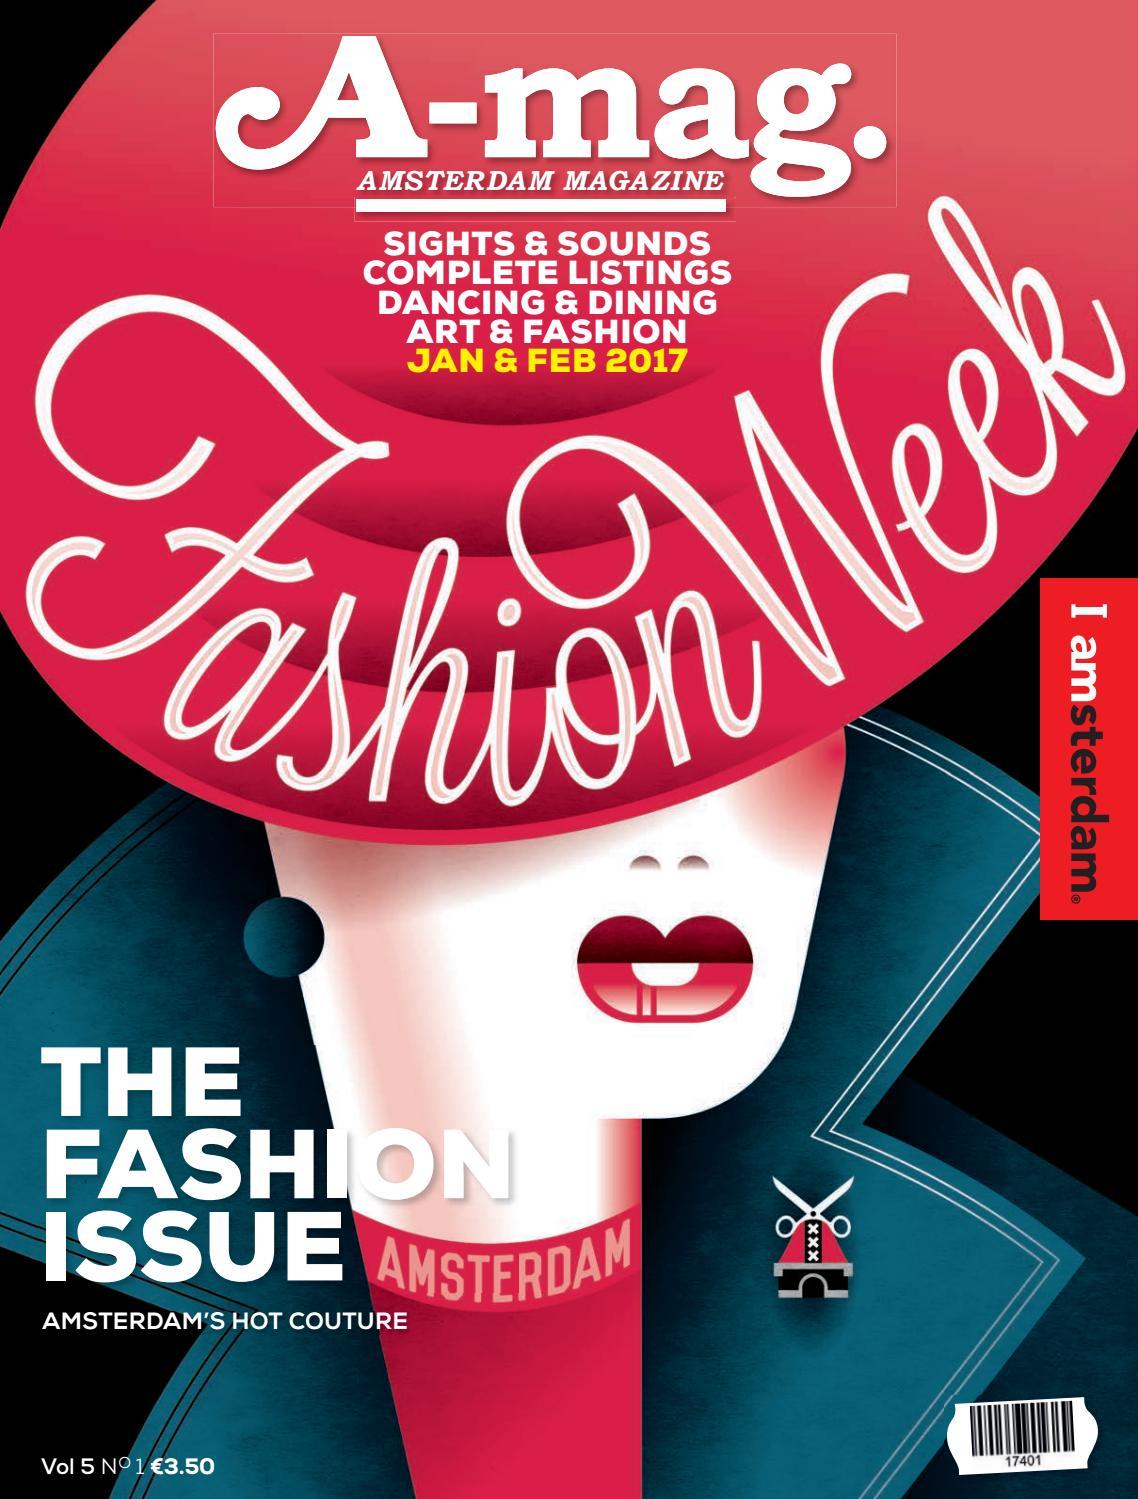 A-mag - Amsterdam Magazine - Vol  5, No  1 - Jan/Feb 2017 by